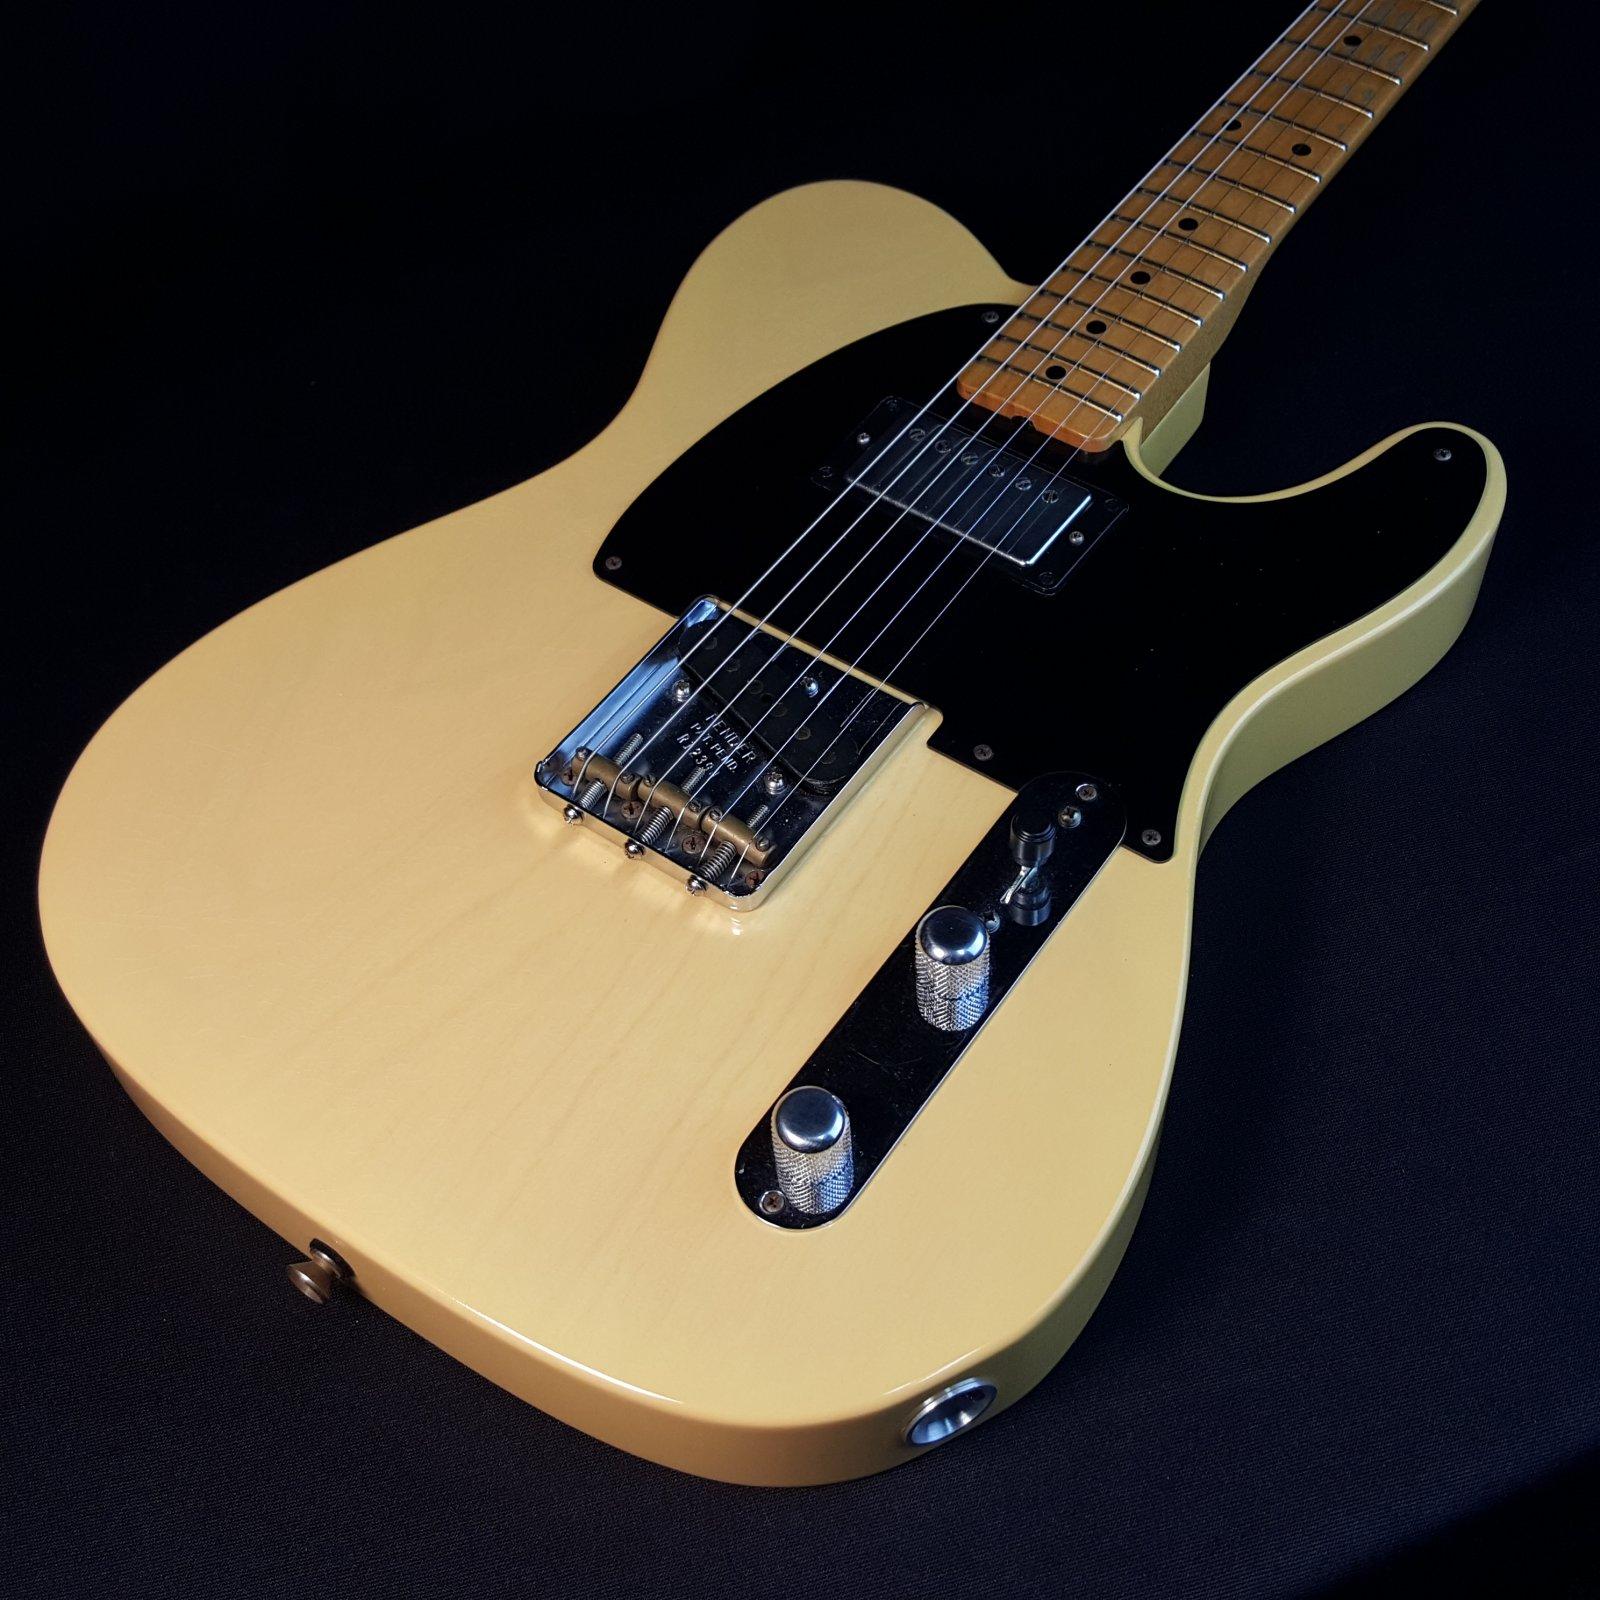 USED Fender Custom Shop 1952 Telecaster Closet Classic w/Humbucker Relic'd w/Original Case